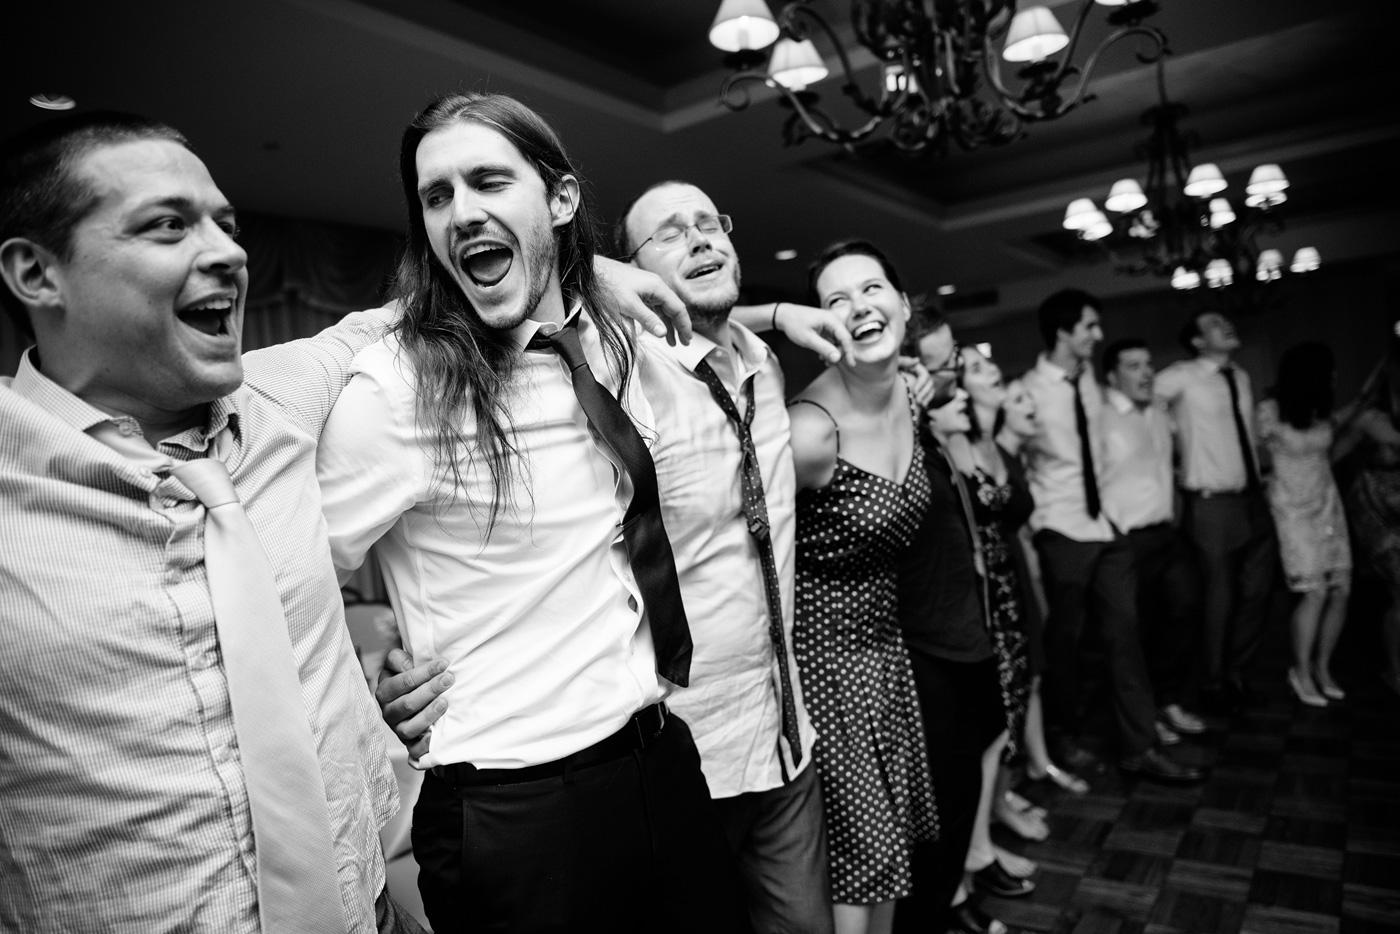 st clair country club wedding reception dancing